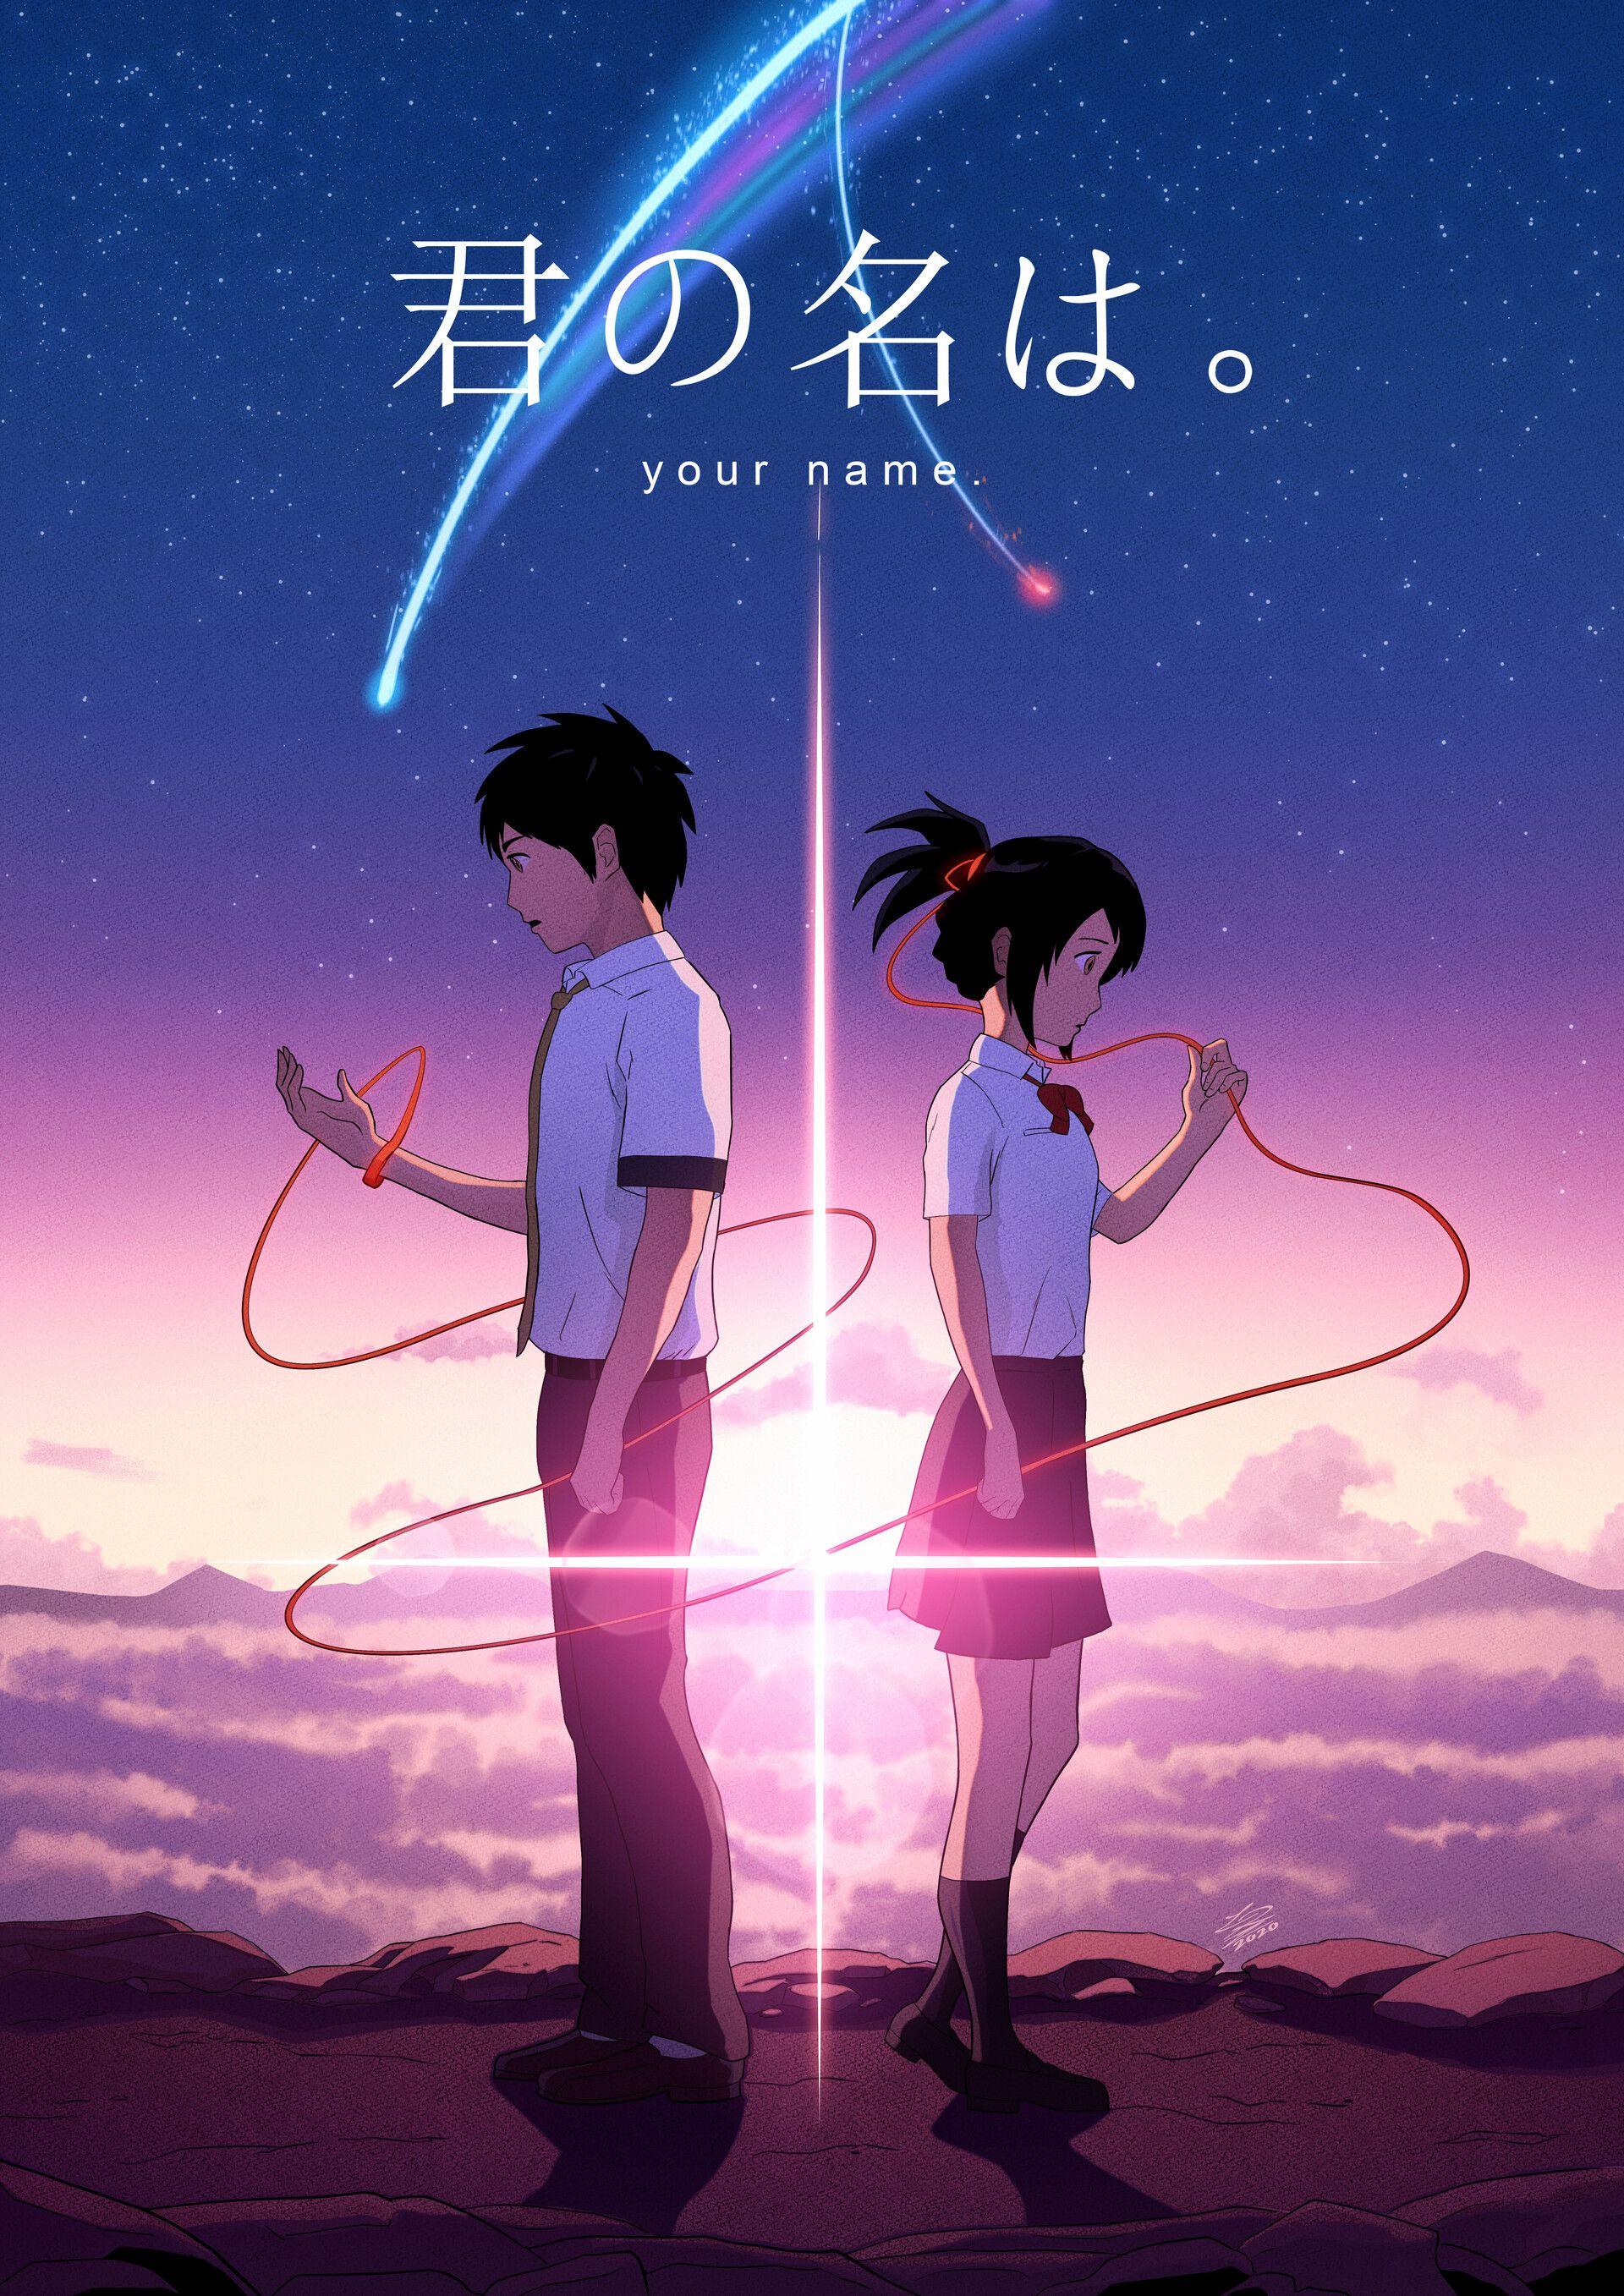 Kimi No Na Wa Your Name Fan Poster Kimi No Na Wa Poster Japones Animes Wallpapers